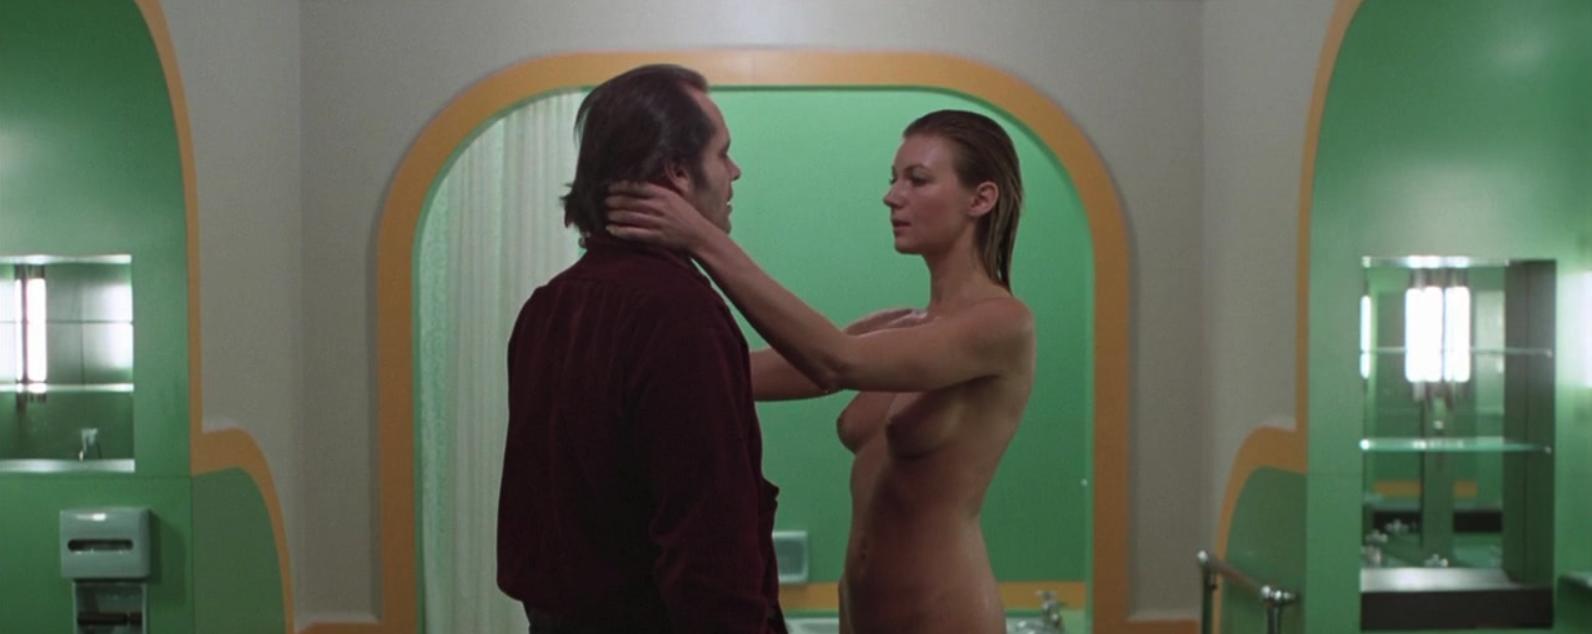 Lia Beldam and Jack Nicholson The Shining Kiss Scene